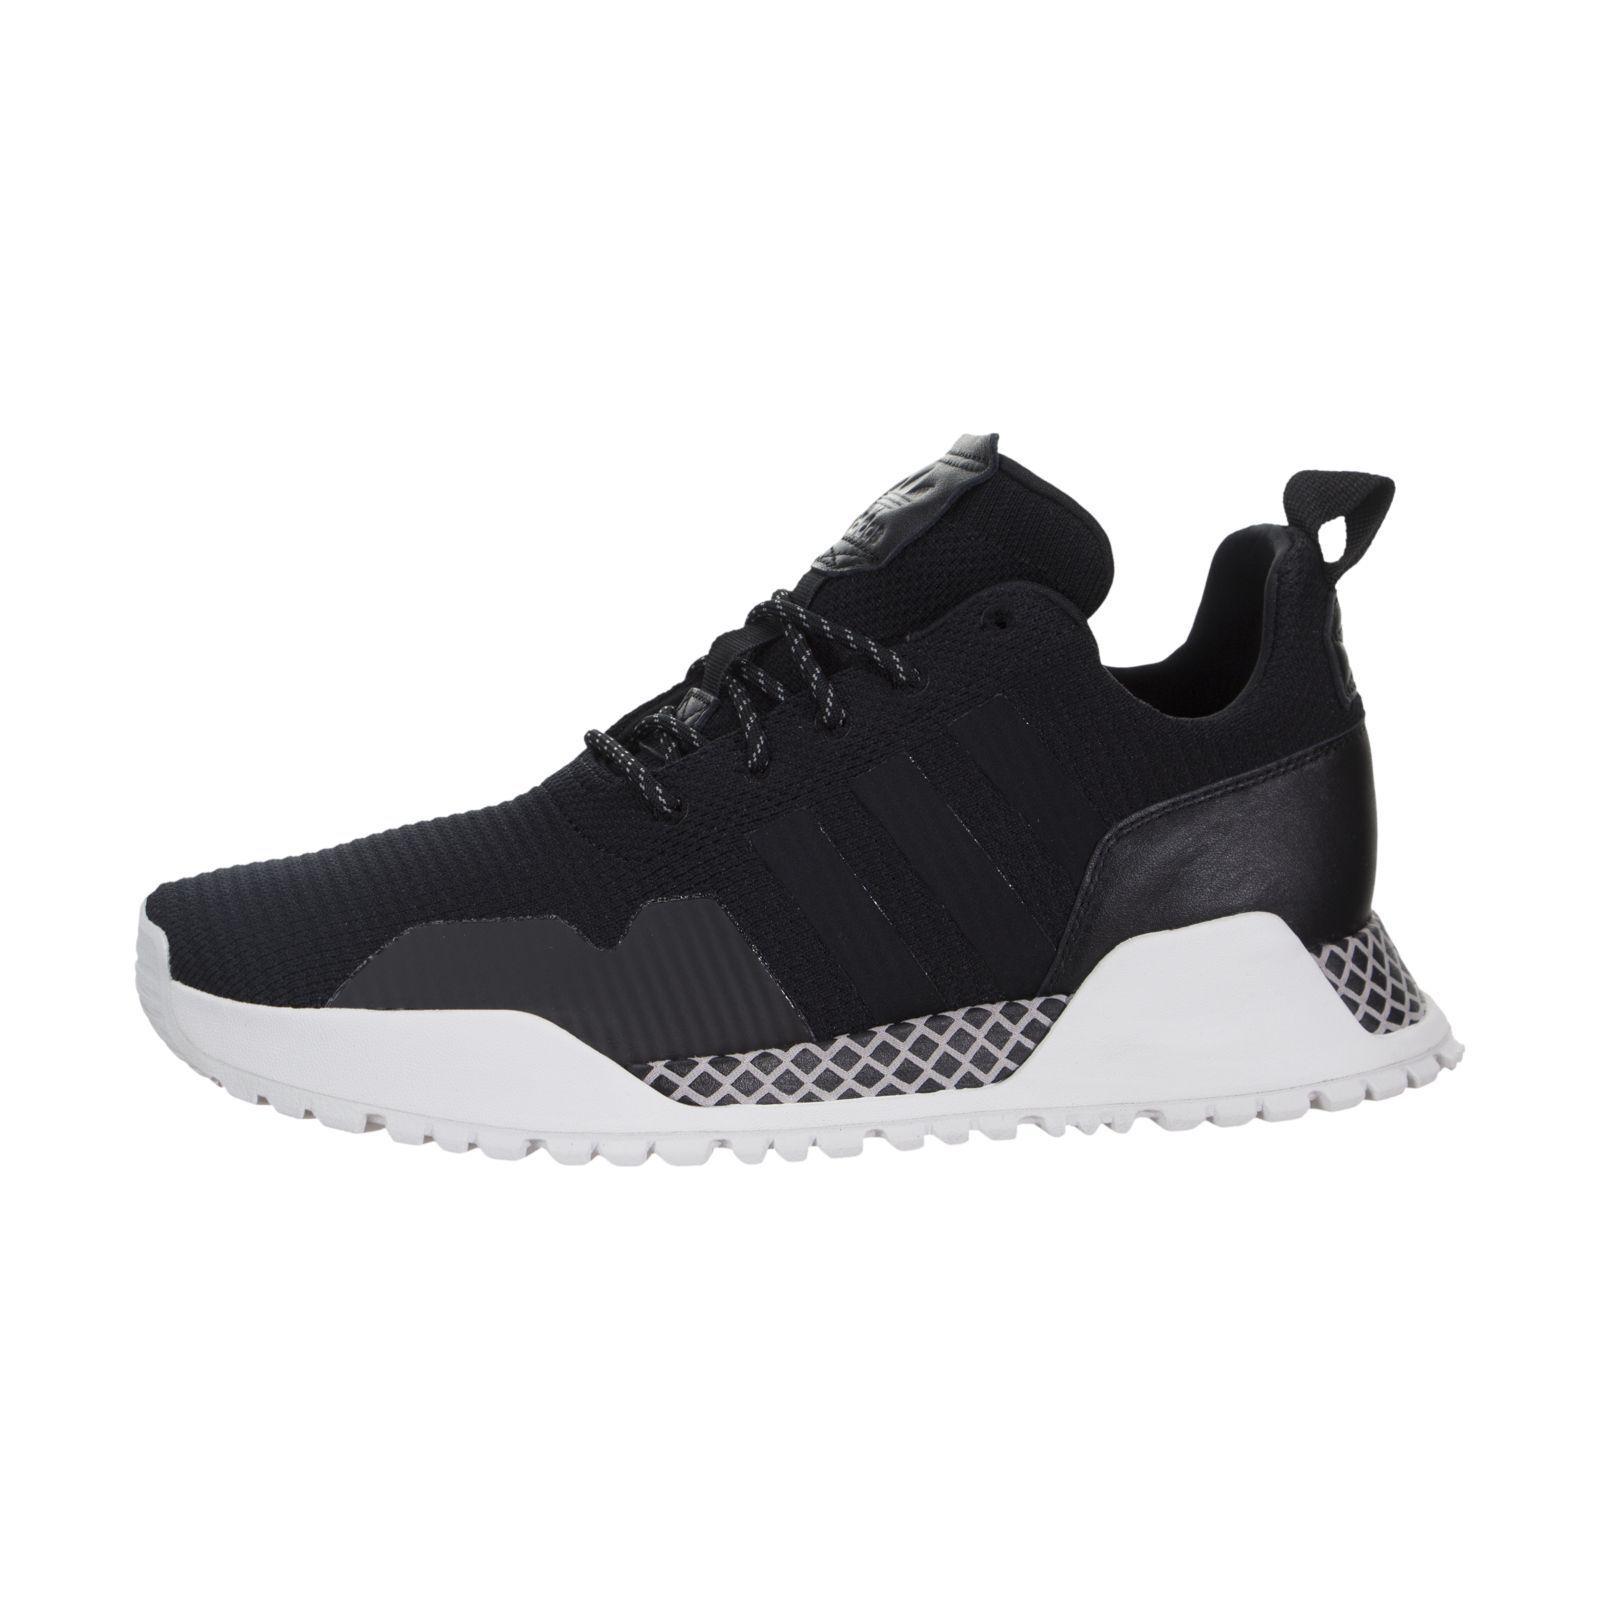 Cheap Nice Adidas AF 1.4 (Primeknit) on the sale